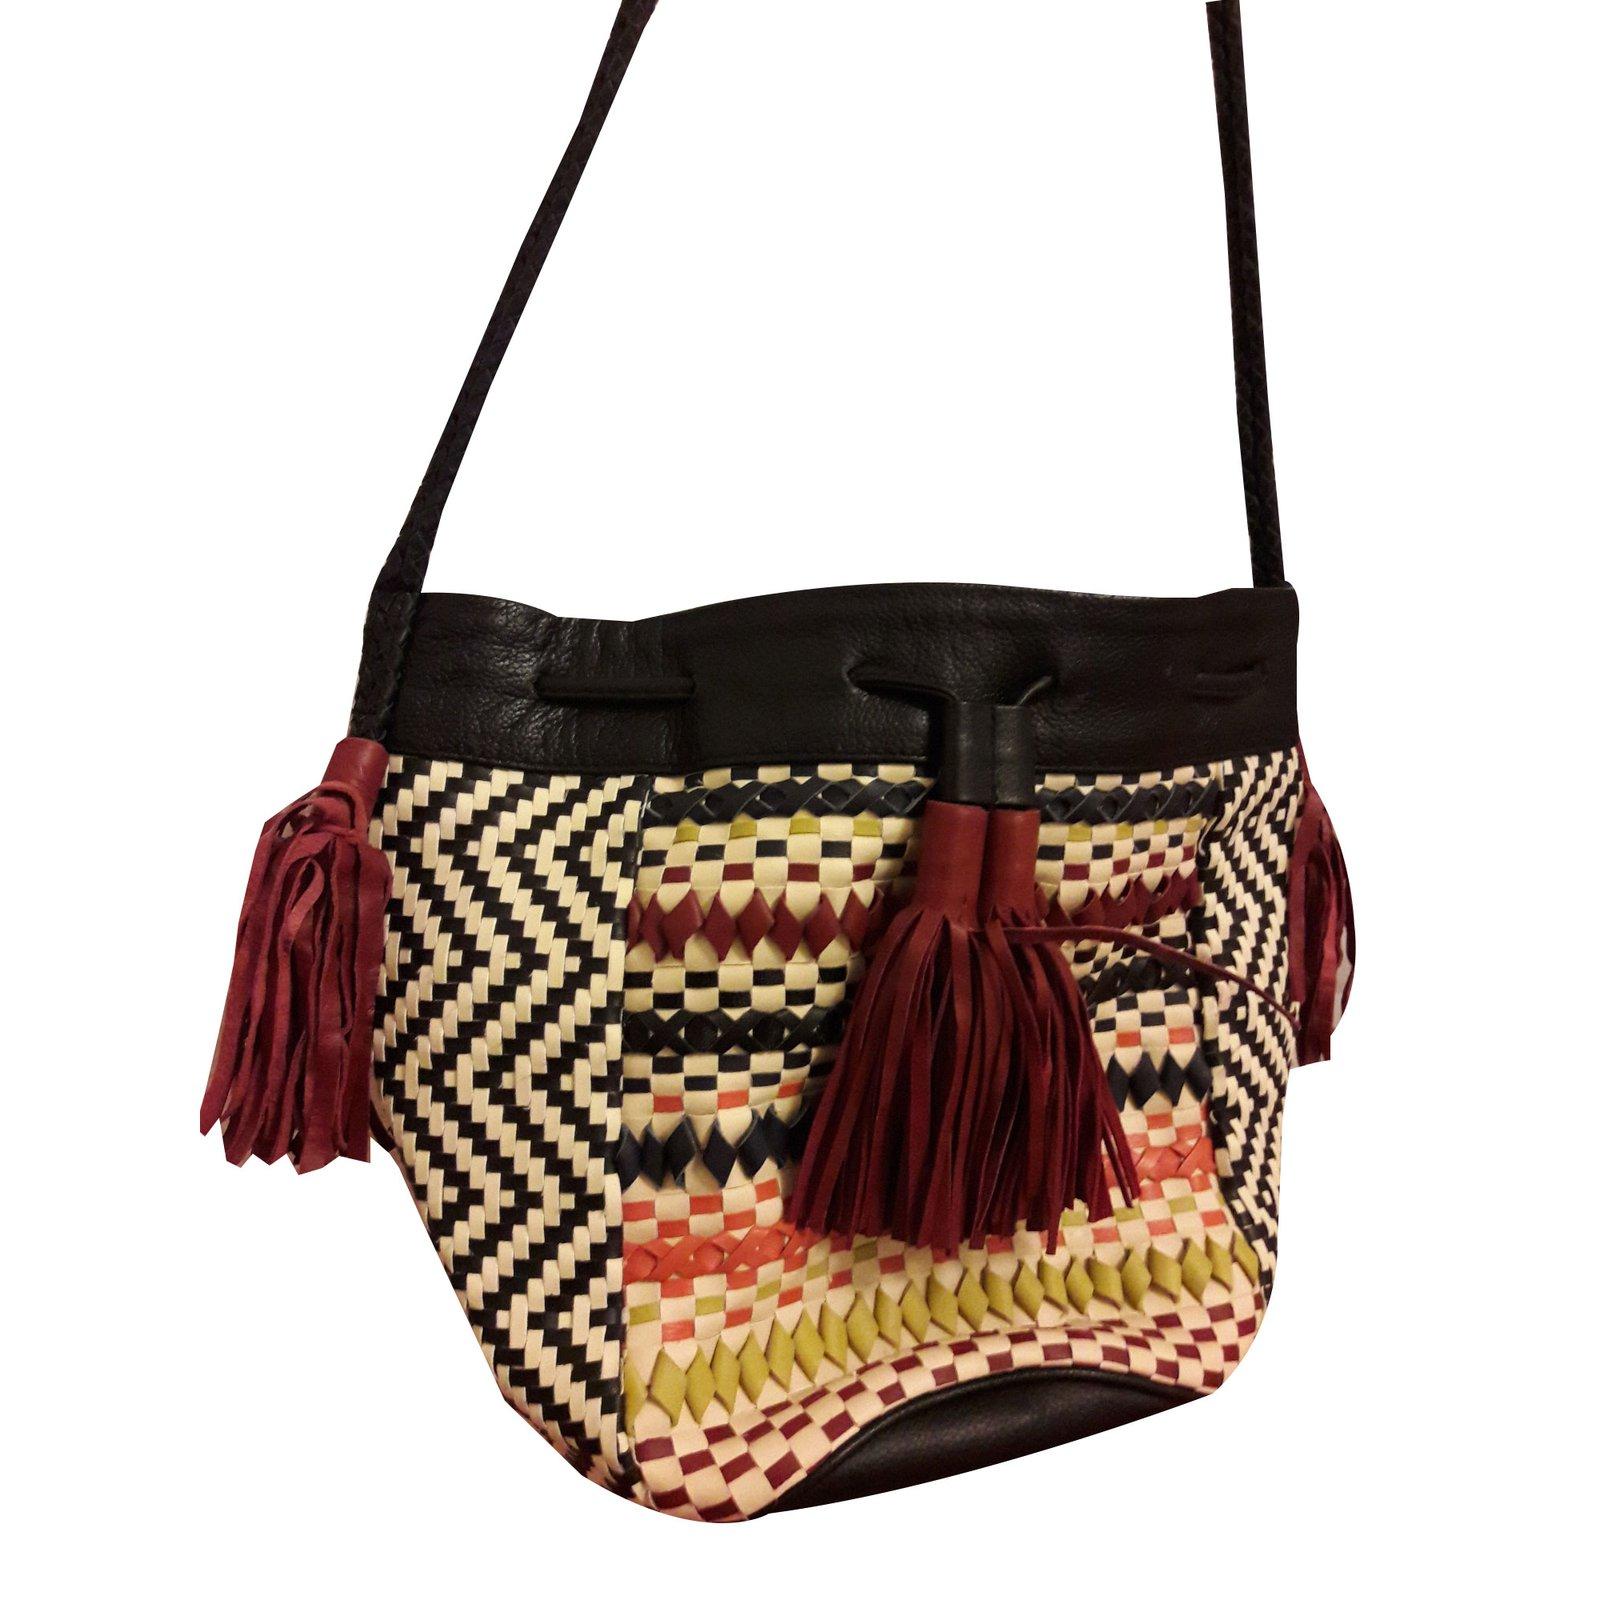 Antik Batik Handbag Handbags Pony Hair Black Ref 44191